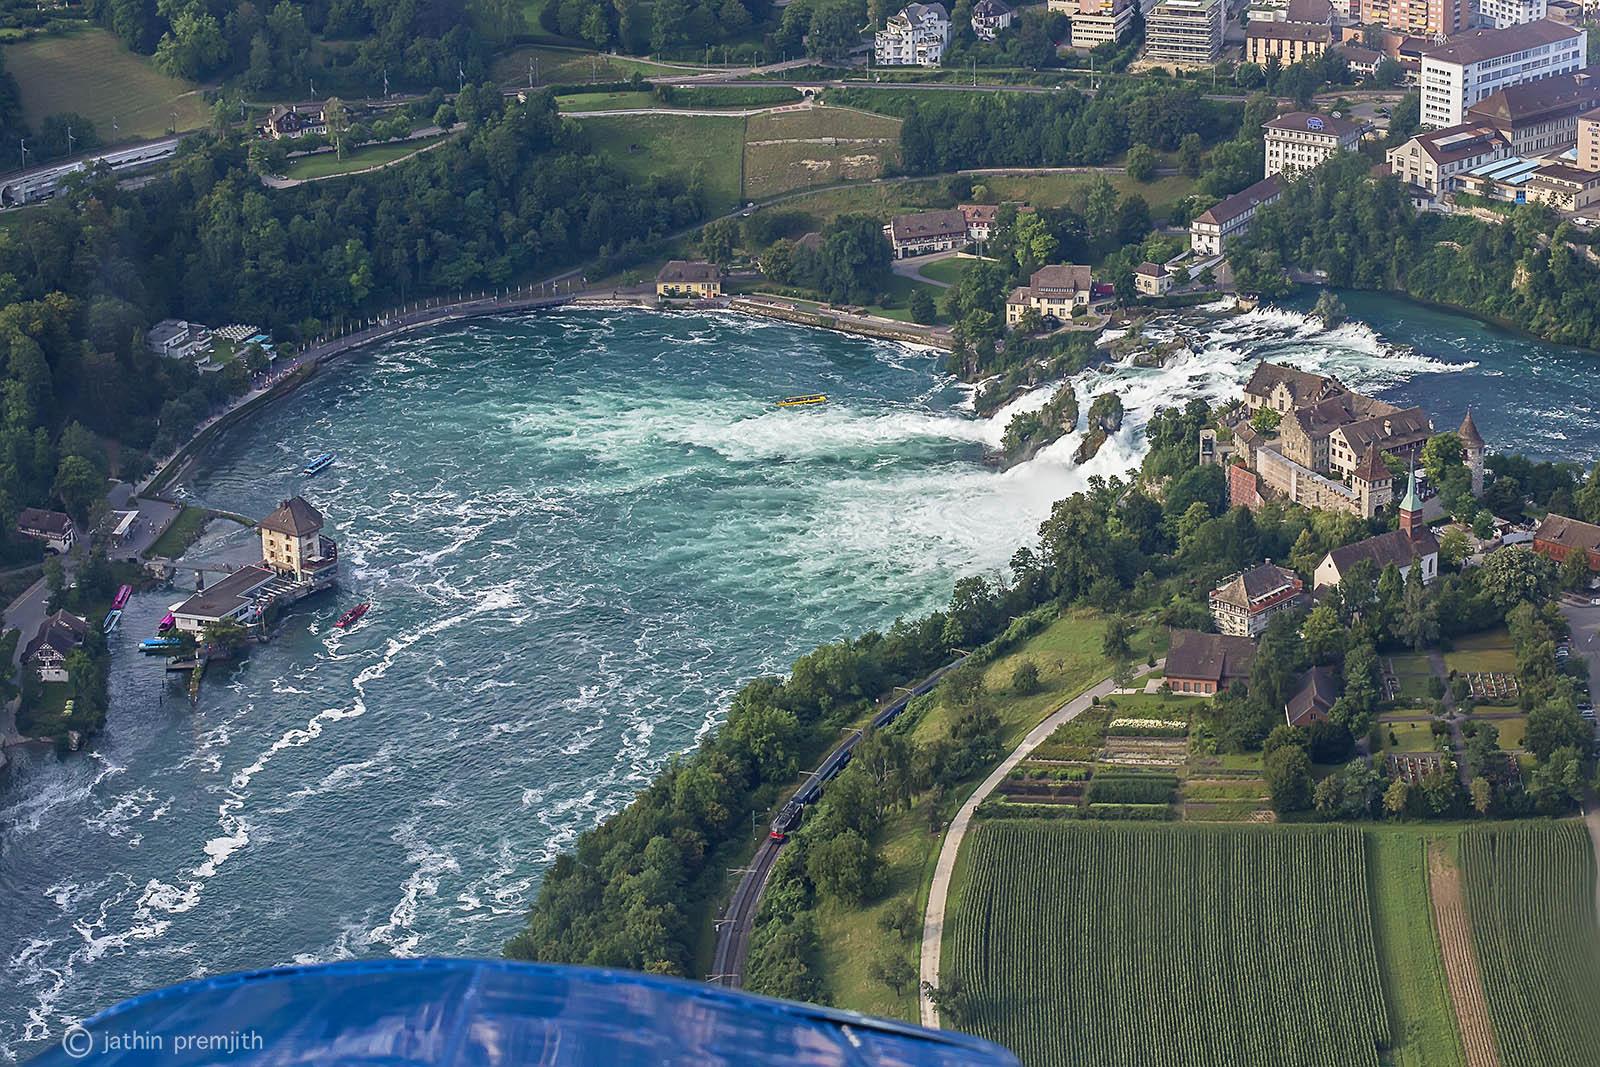 """RHINFALL"" - THE  BIGGEST  WATERFALL  OF  EUROPE."